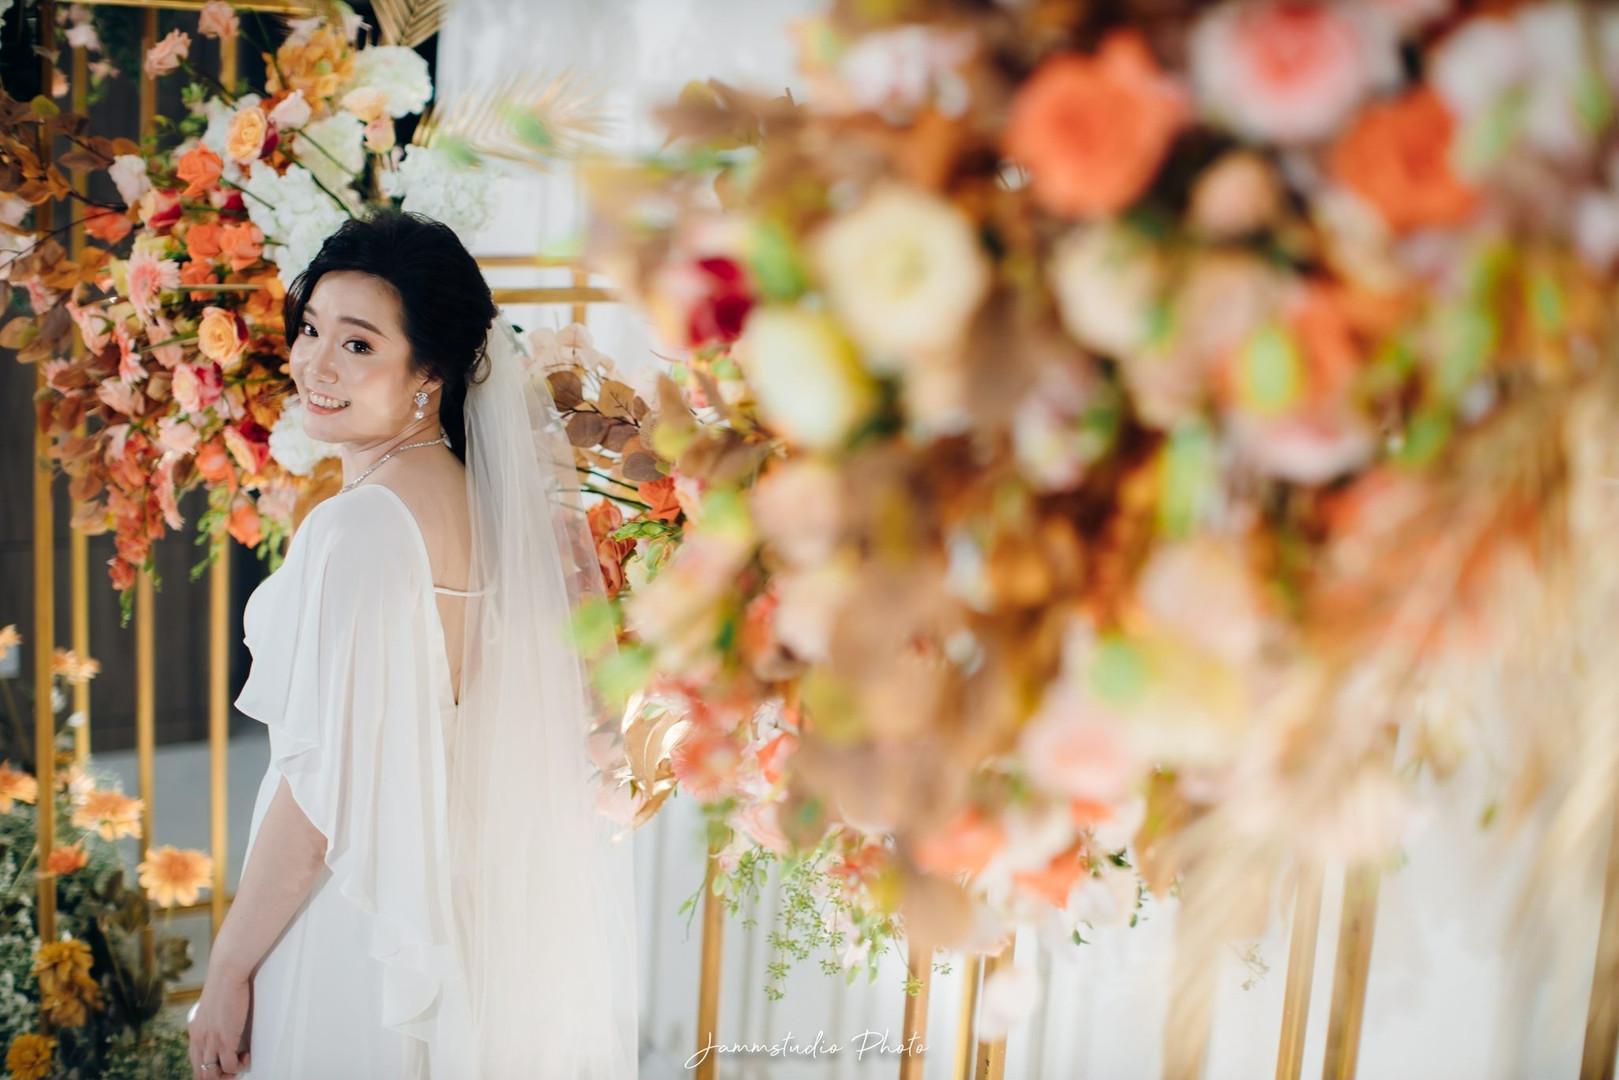 Sothida Magnolia dress 12